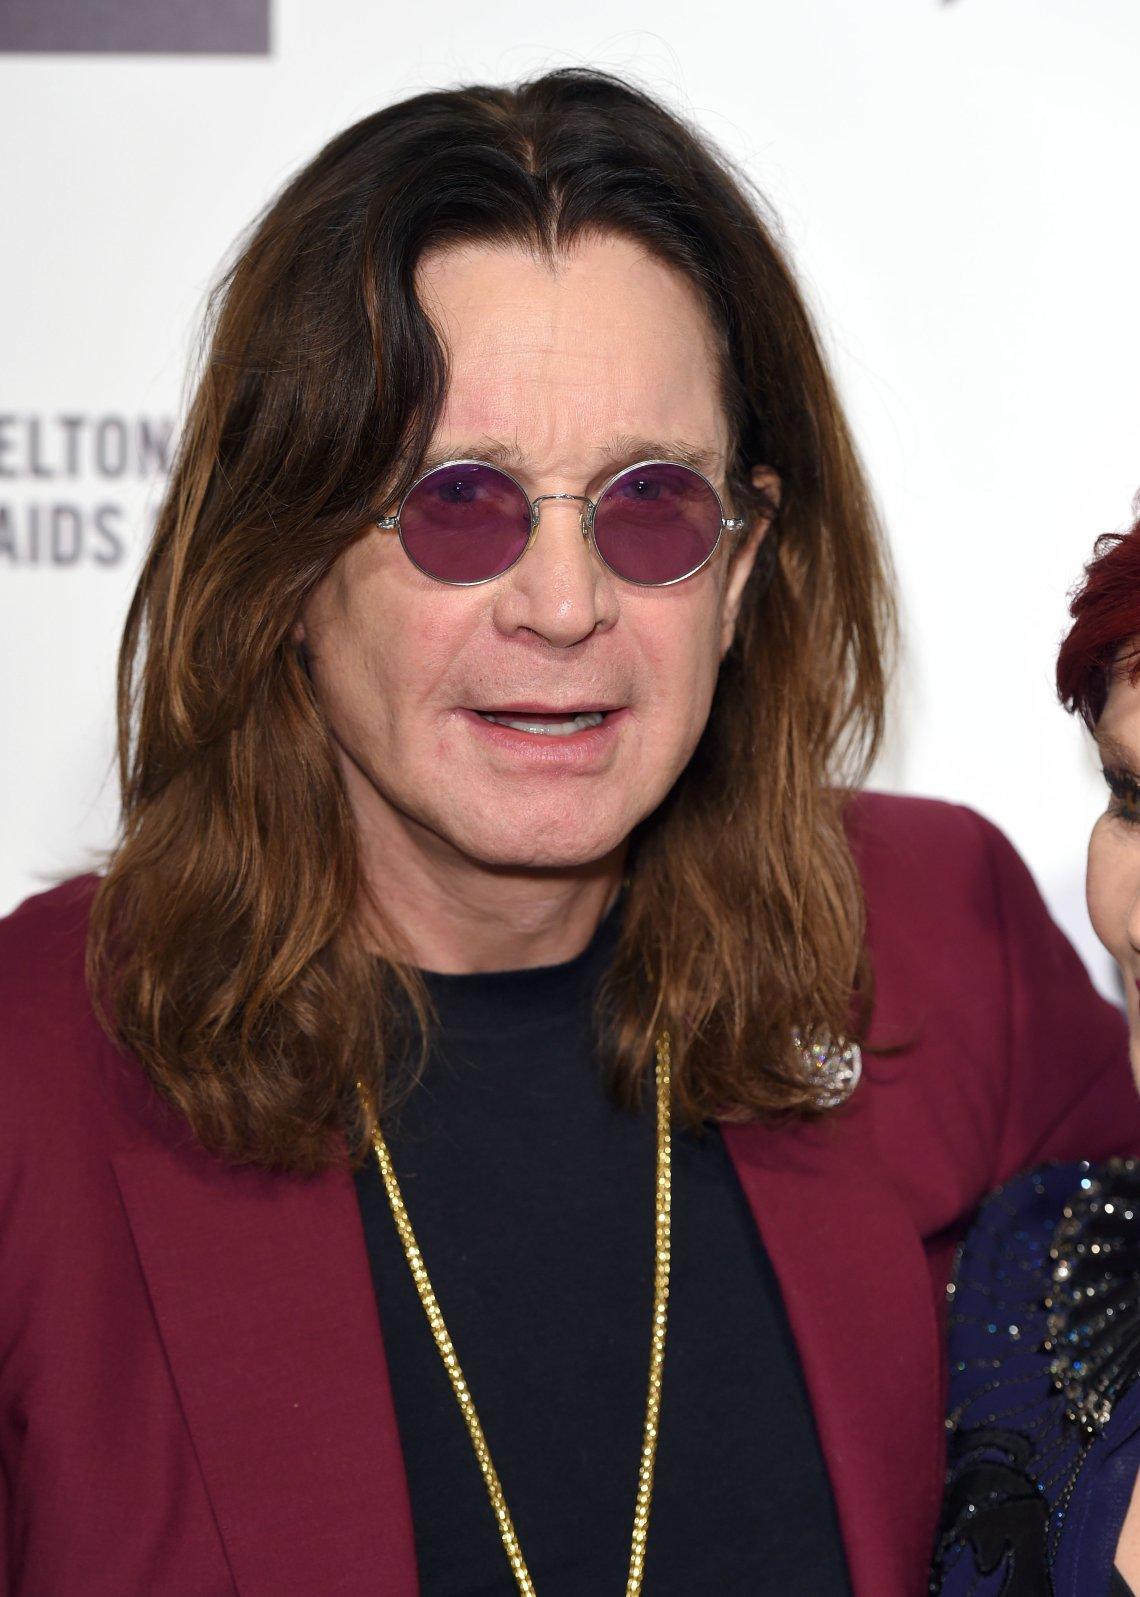 Ozzy Osbourne has developed pneumonia